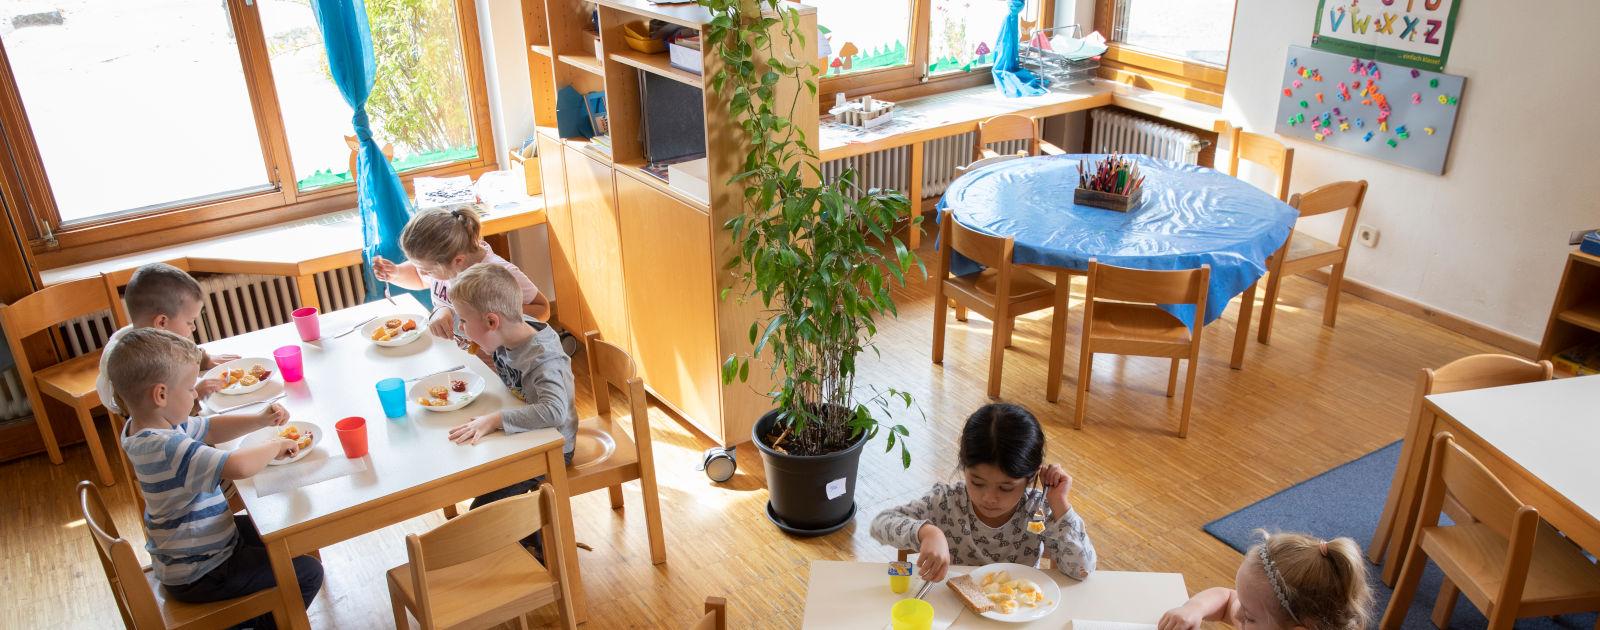 Kinder im Speisesaal im Kindergarten in Willstätt